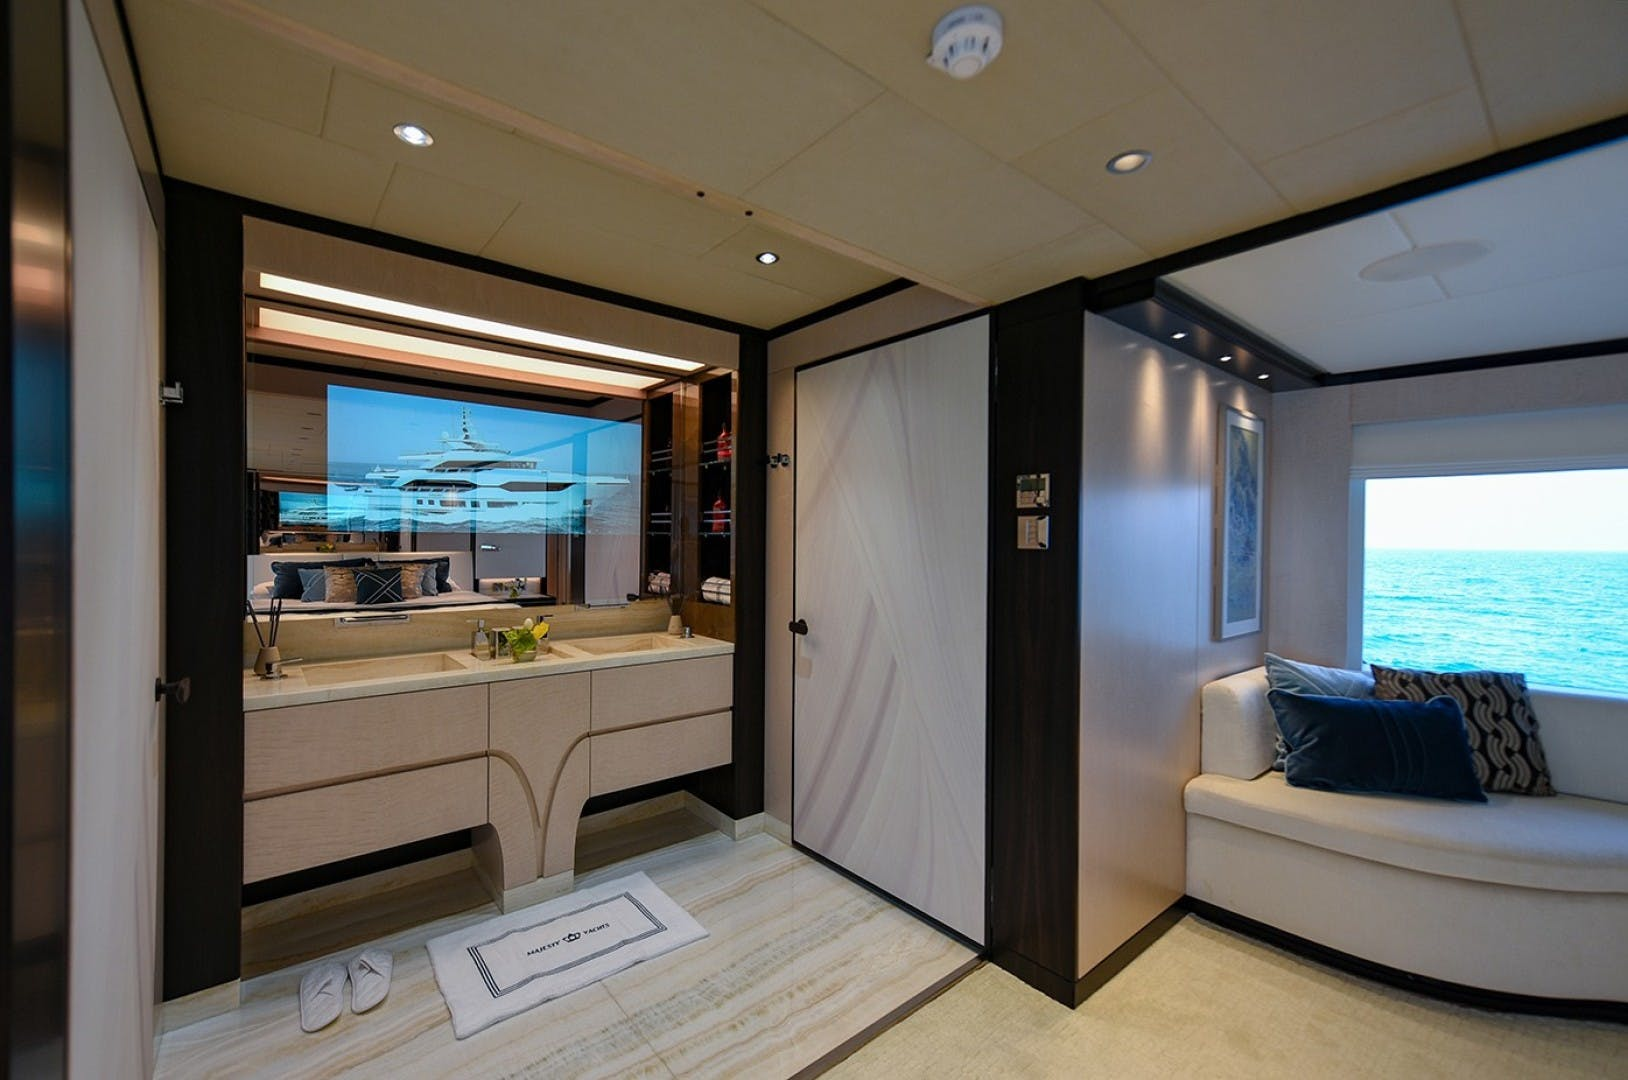 2022 Majesty Yachts 120' Raised Pilothouse MAJESTY 120 | Picture 7 of 39